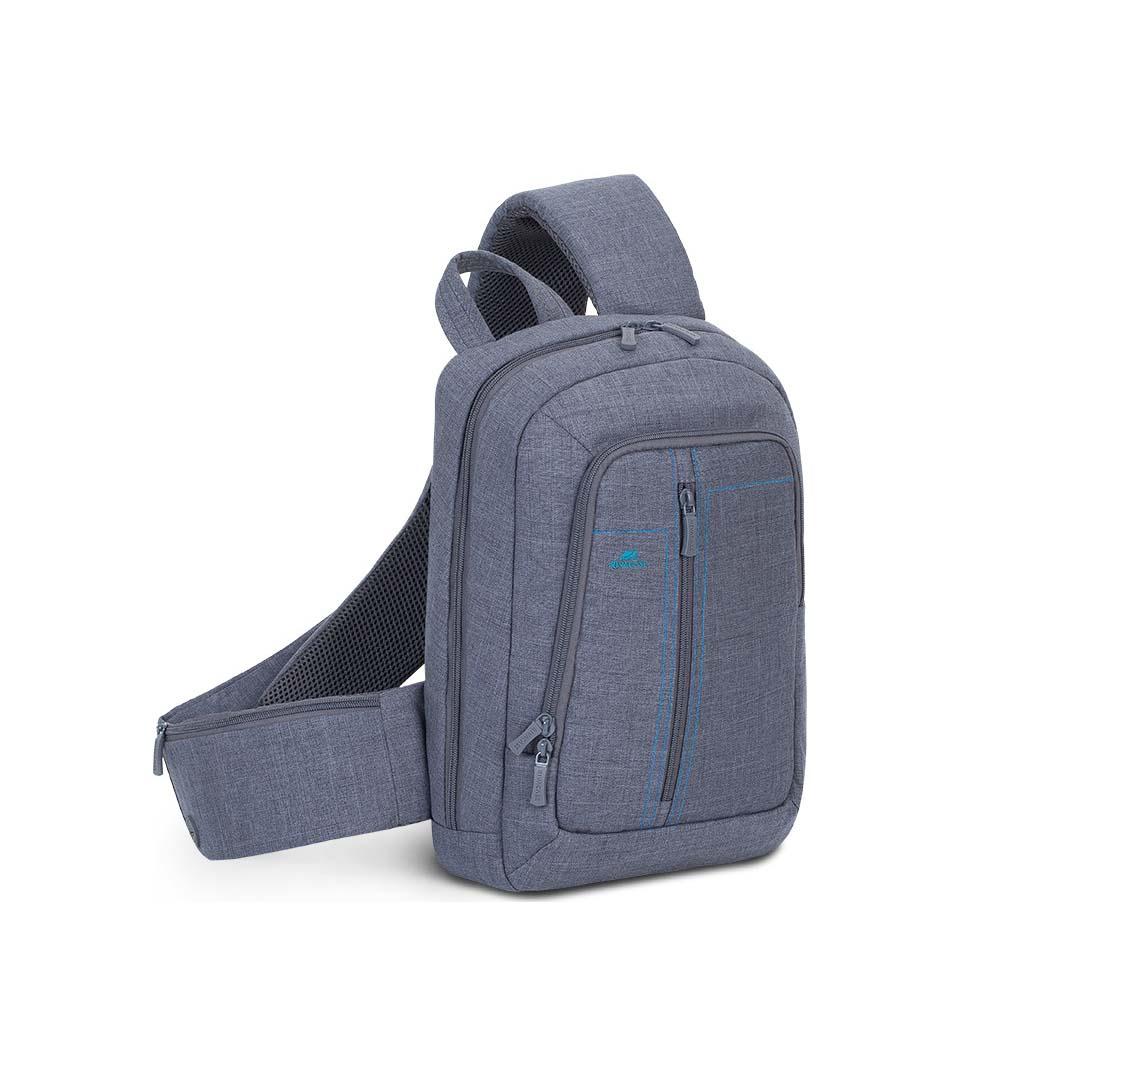 "Rivacase Alpendorf 7529 Αδιάβροχη Τσάντα Πλάτης για Laptop 13.3""  Grey"